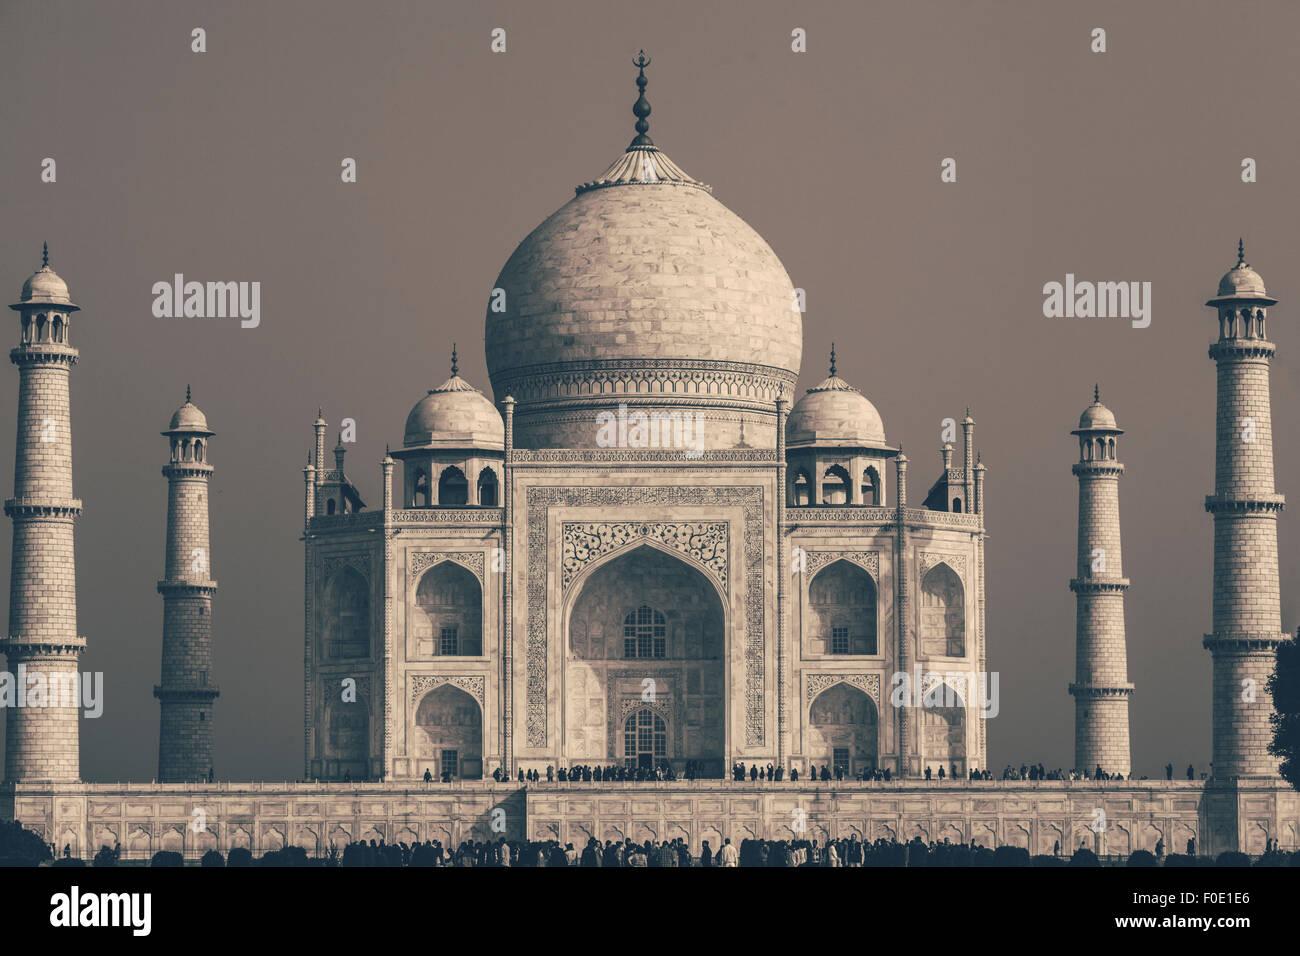 taj mahal wallpaper stock photos & taj mahal wallpaper stock images